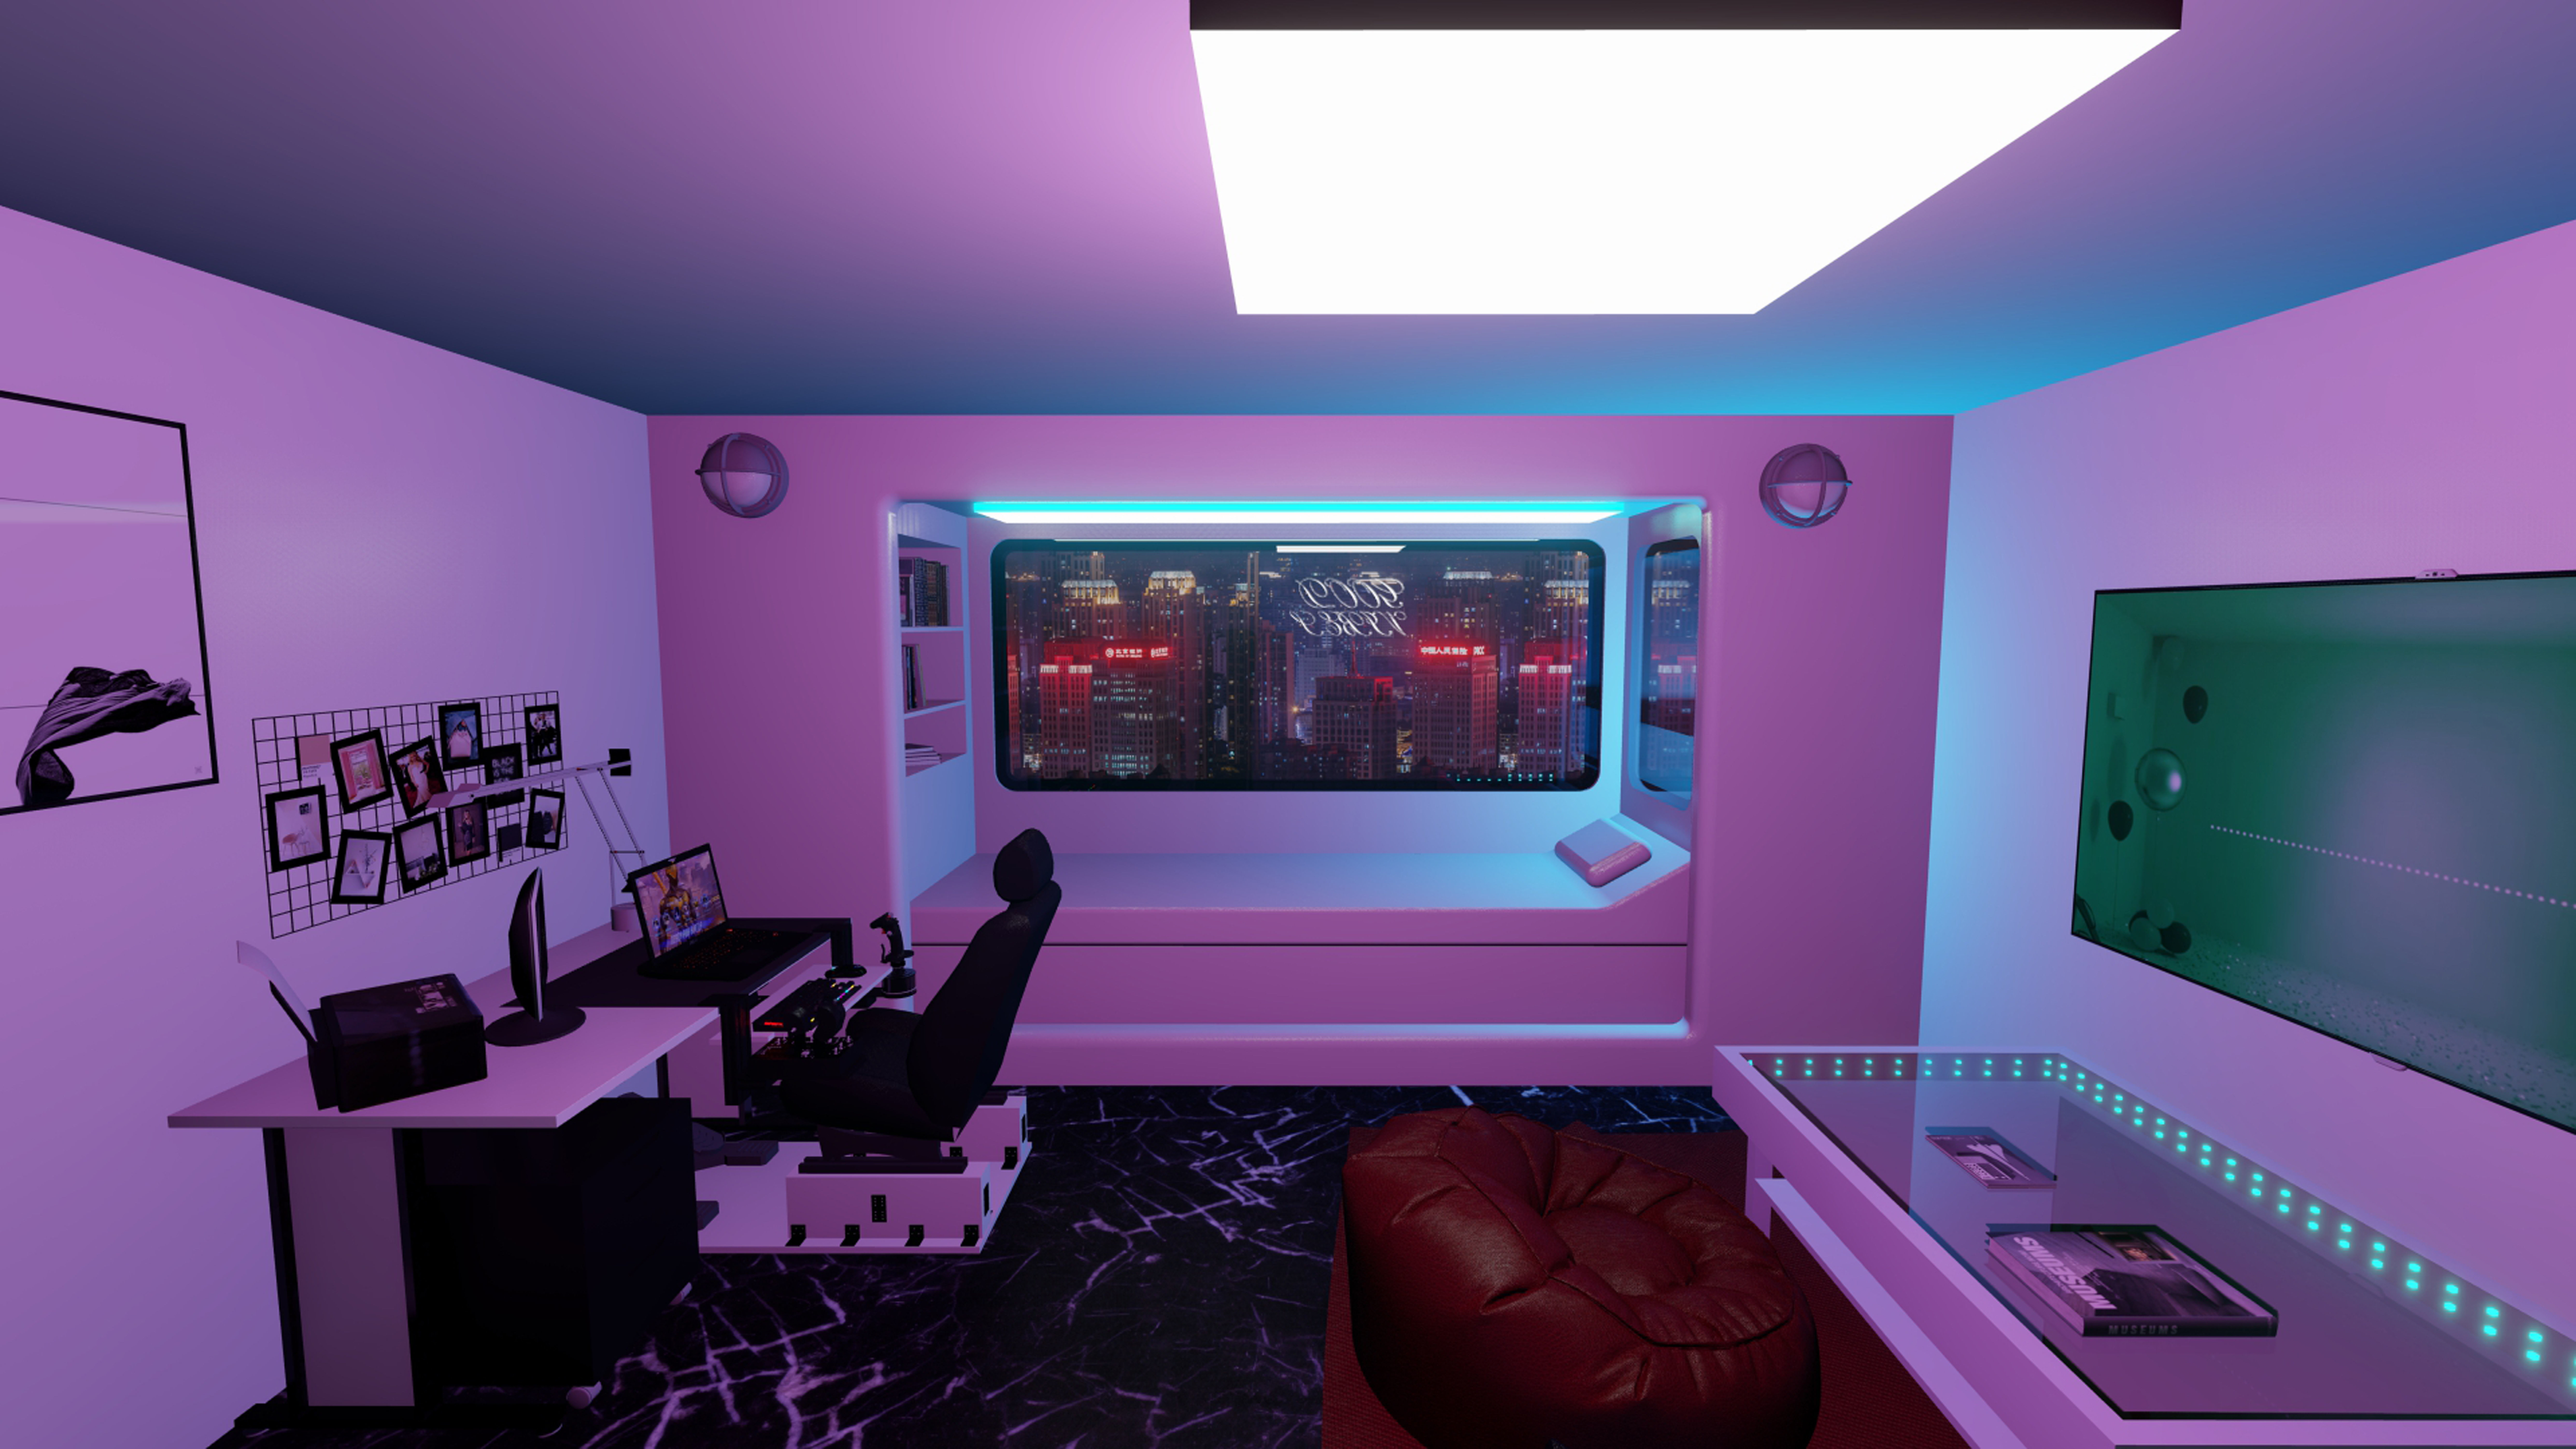 neon aesthetic led room bedroom lights rooms always holographic bedrooms glow digital luxury visit dream